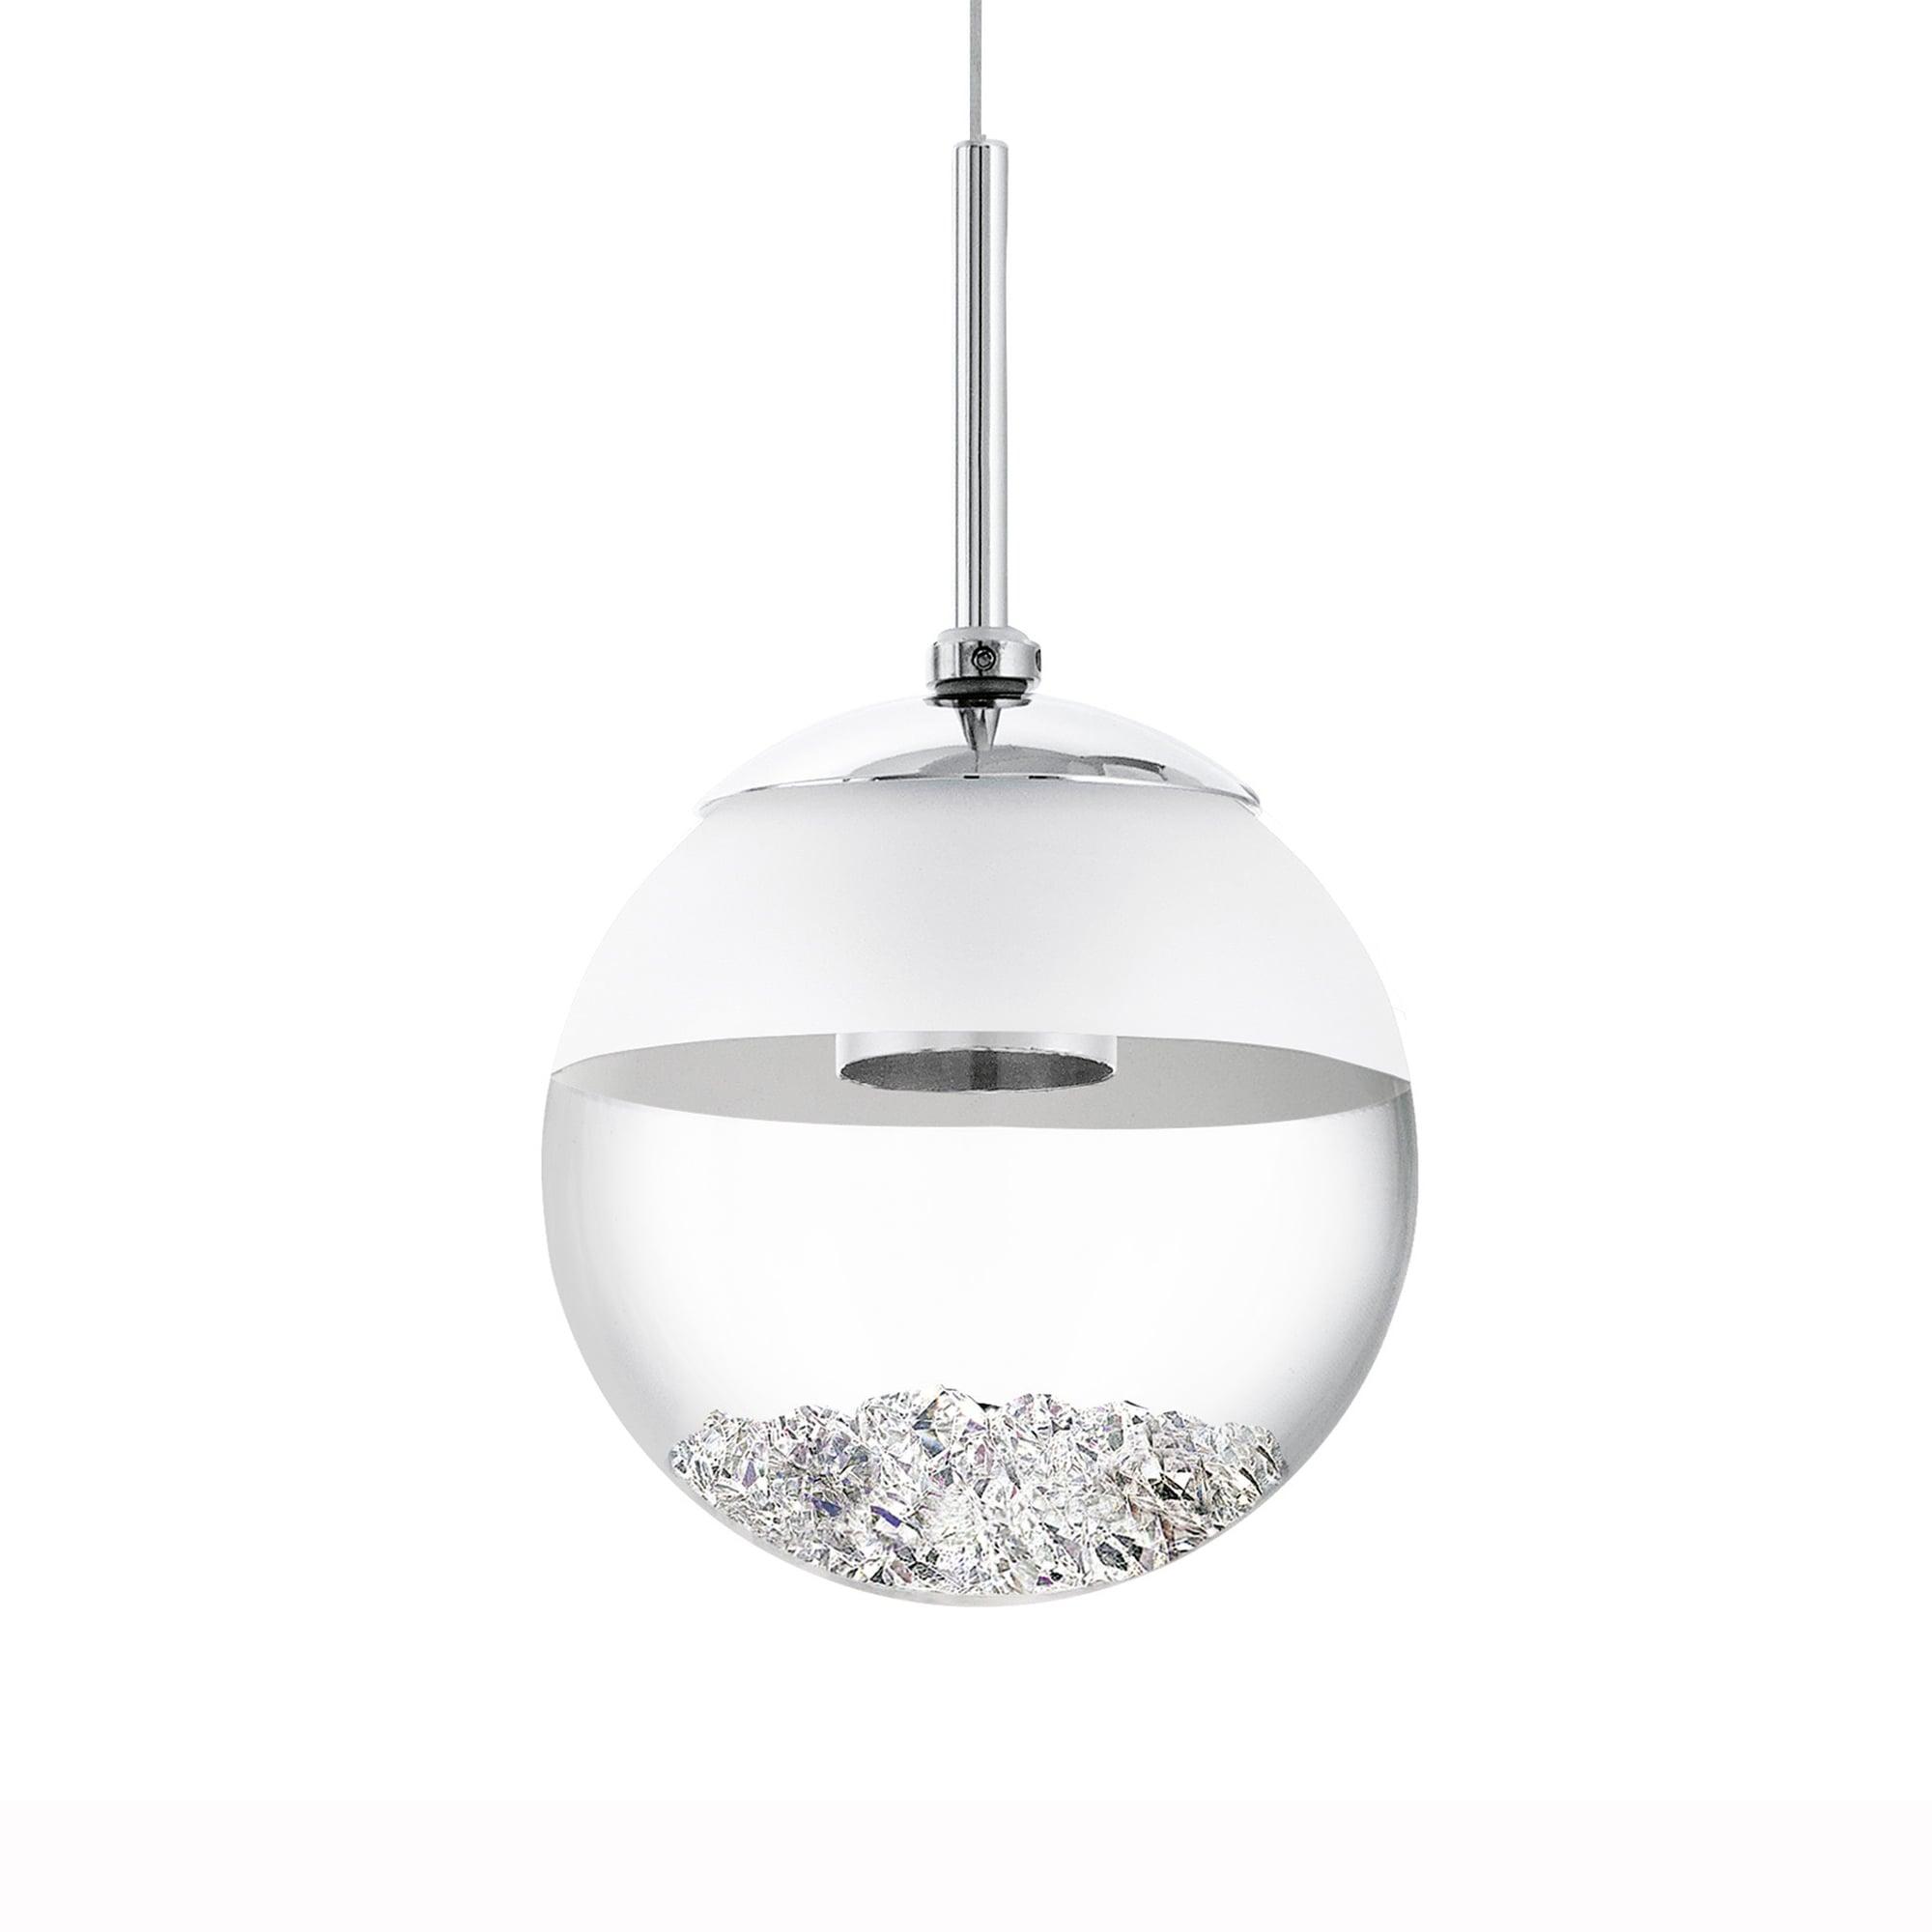 Image of: Eglo 93708 Montefio 1 Led Crystal Globe Pendant Light